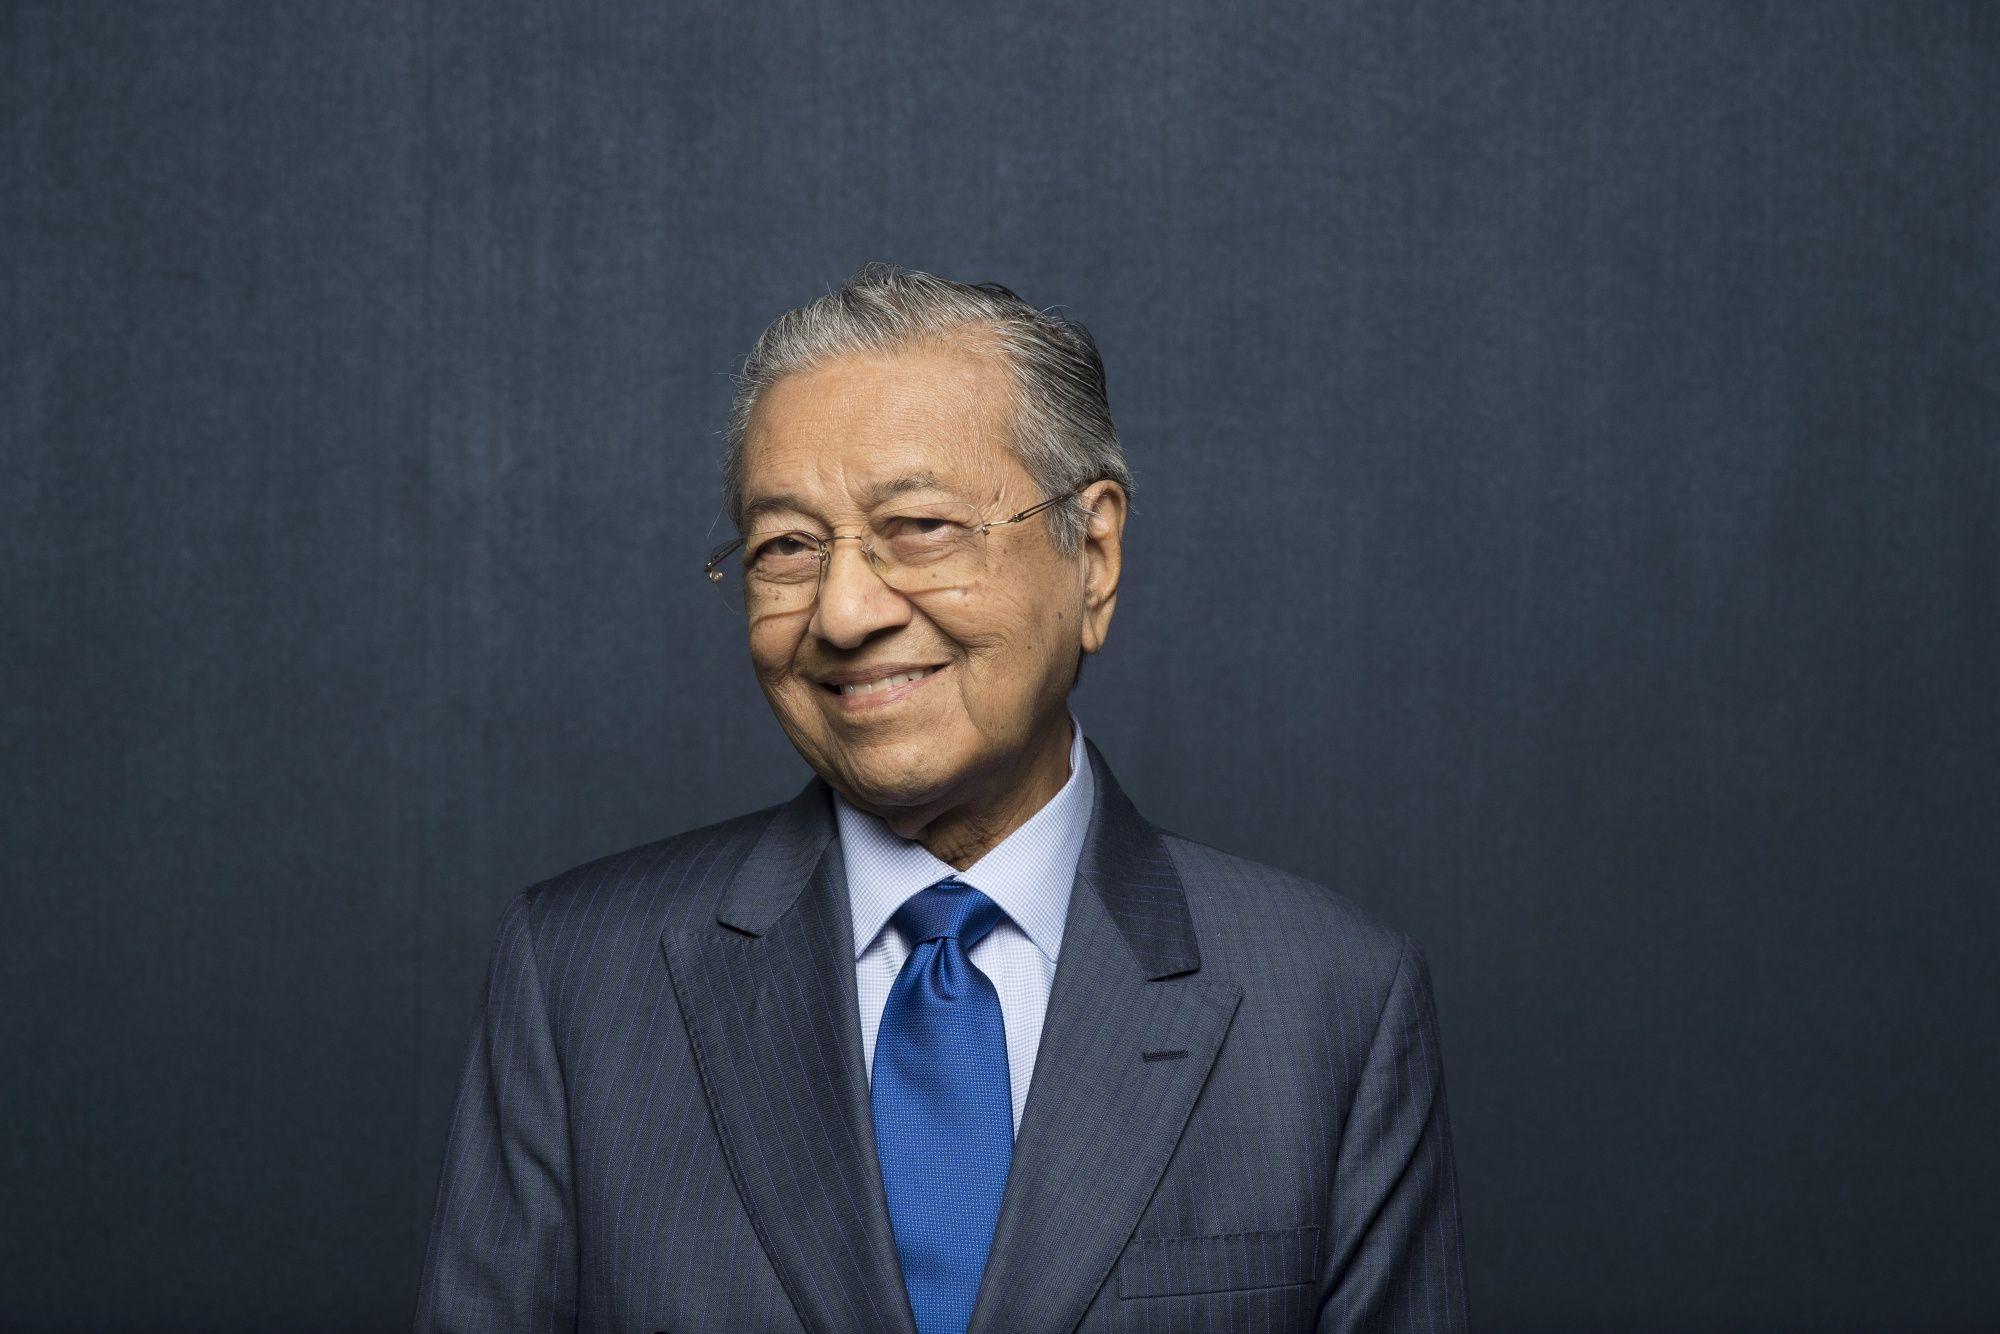 5f0dcf78231 Mahathir Says He Underestimated Challenge of Governing Malaysia ...